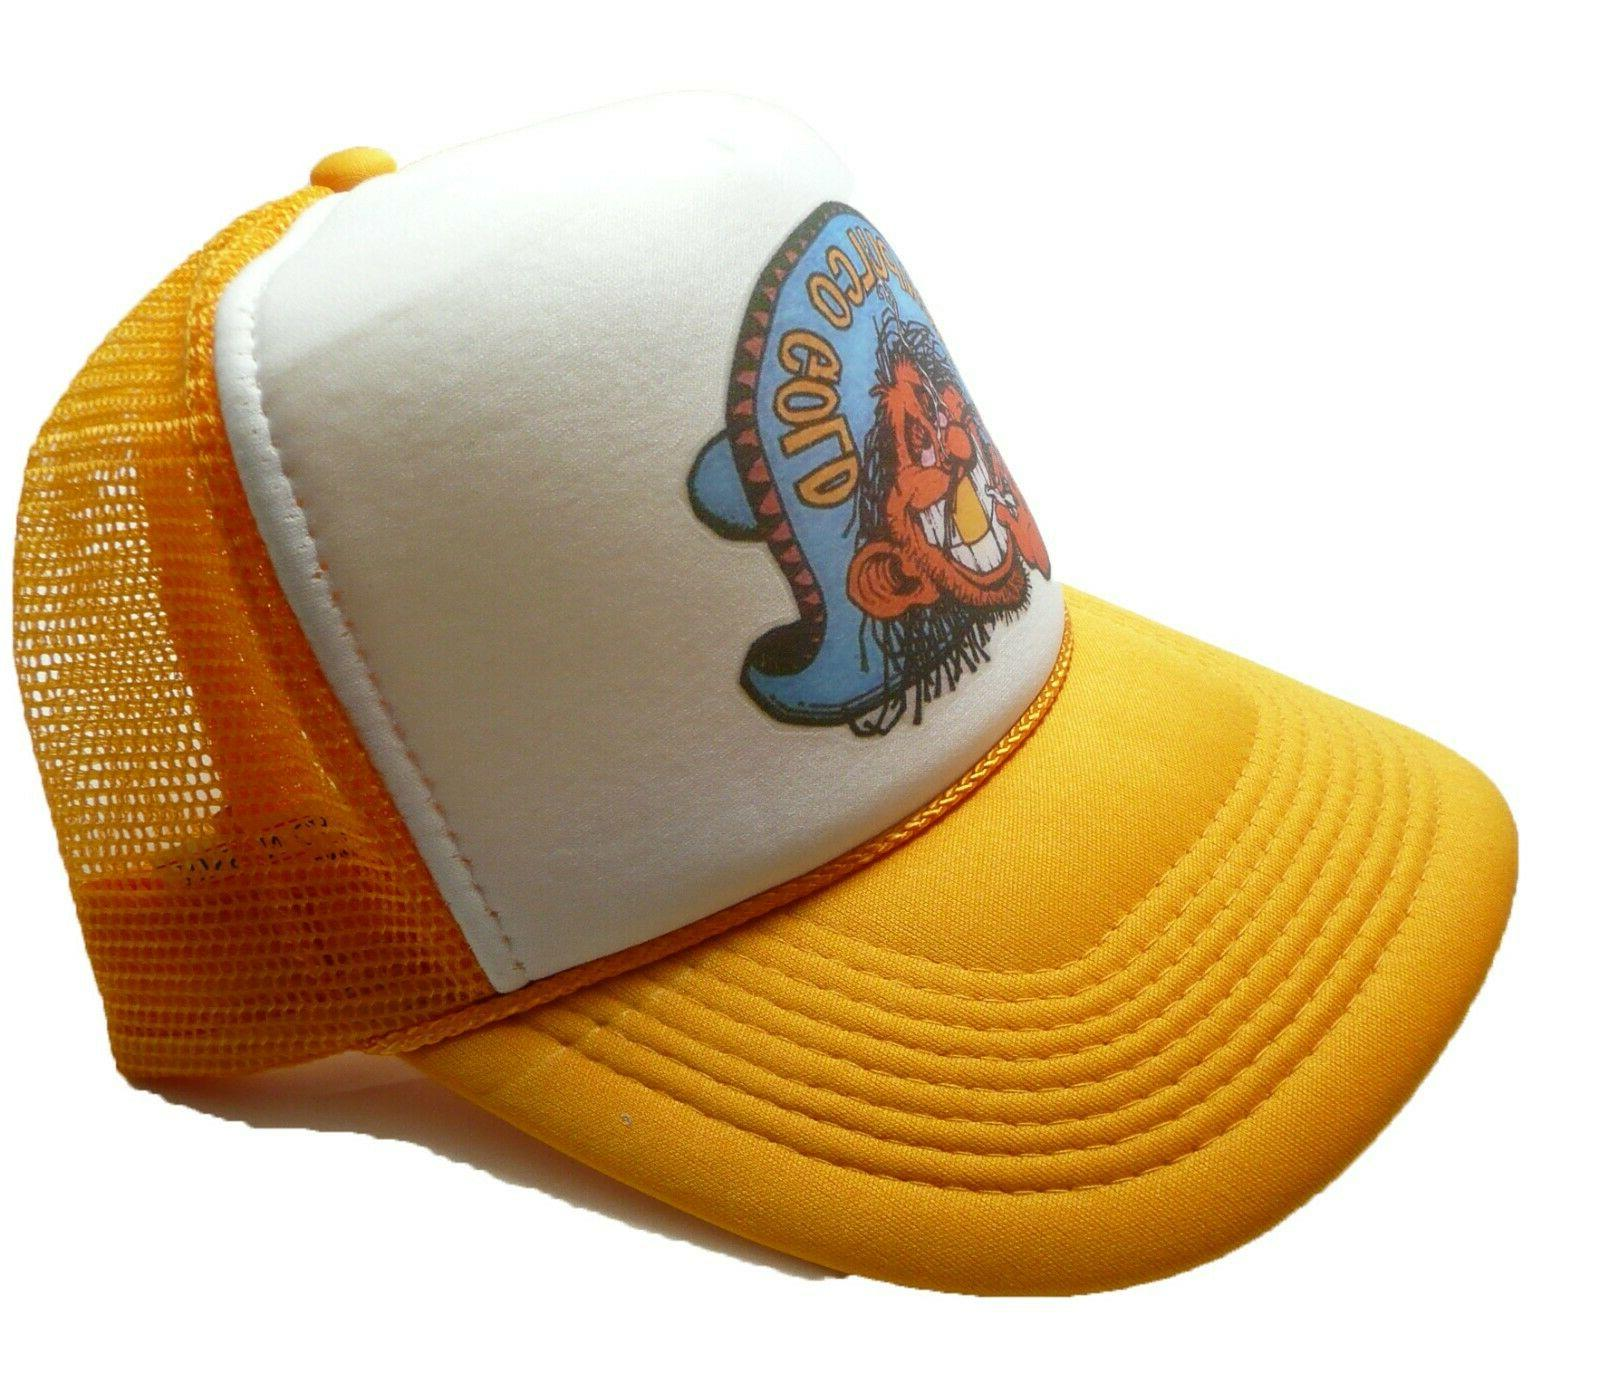 Vintage 80's Acapulco hat hat cap back new